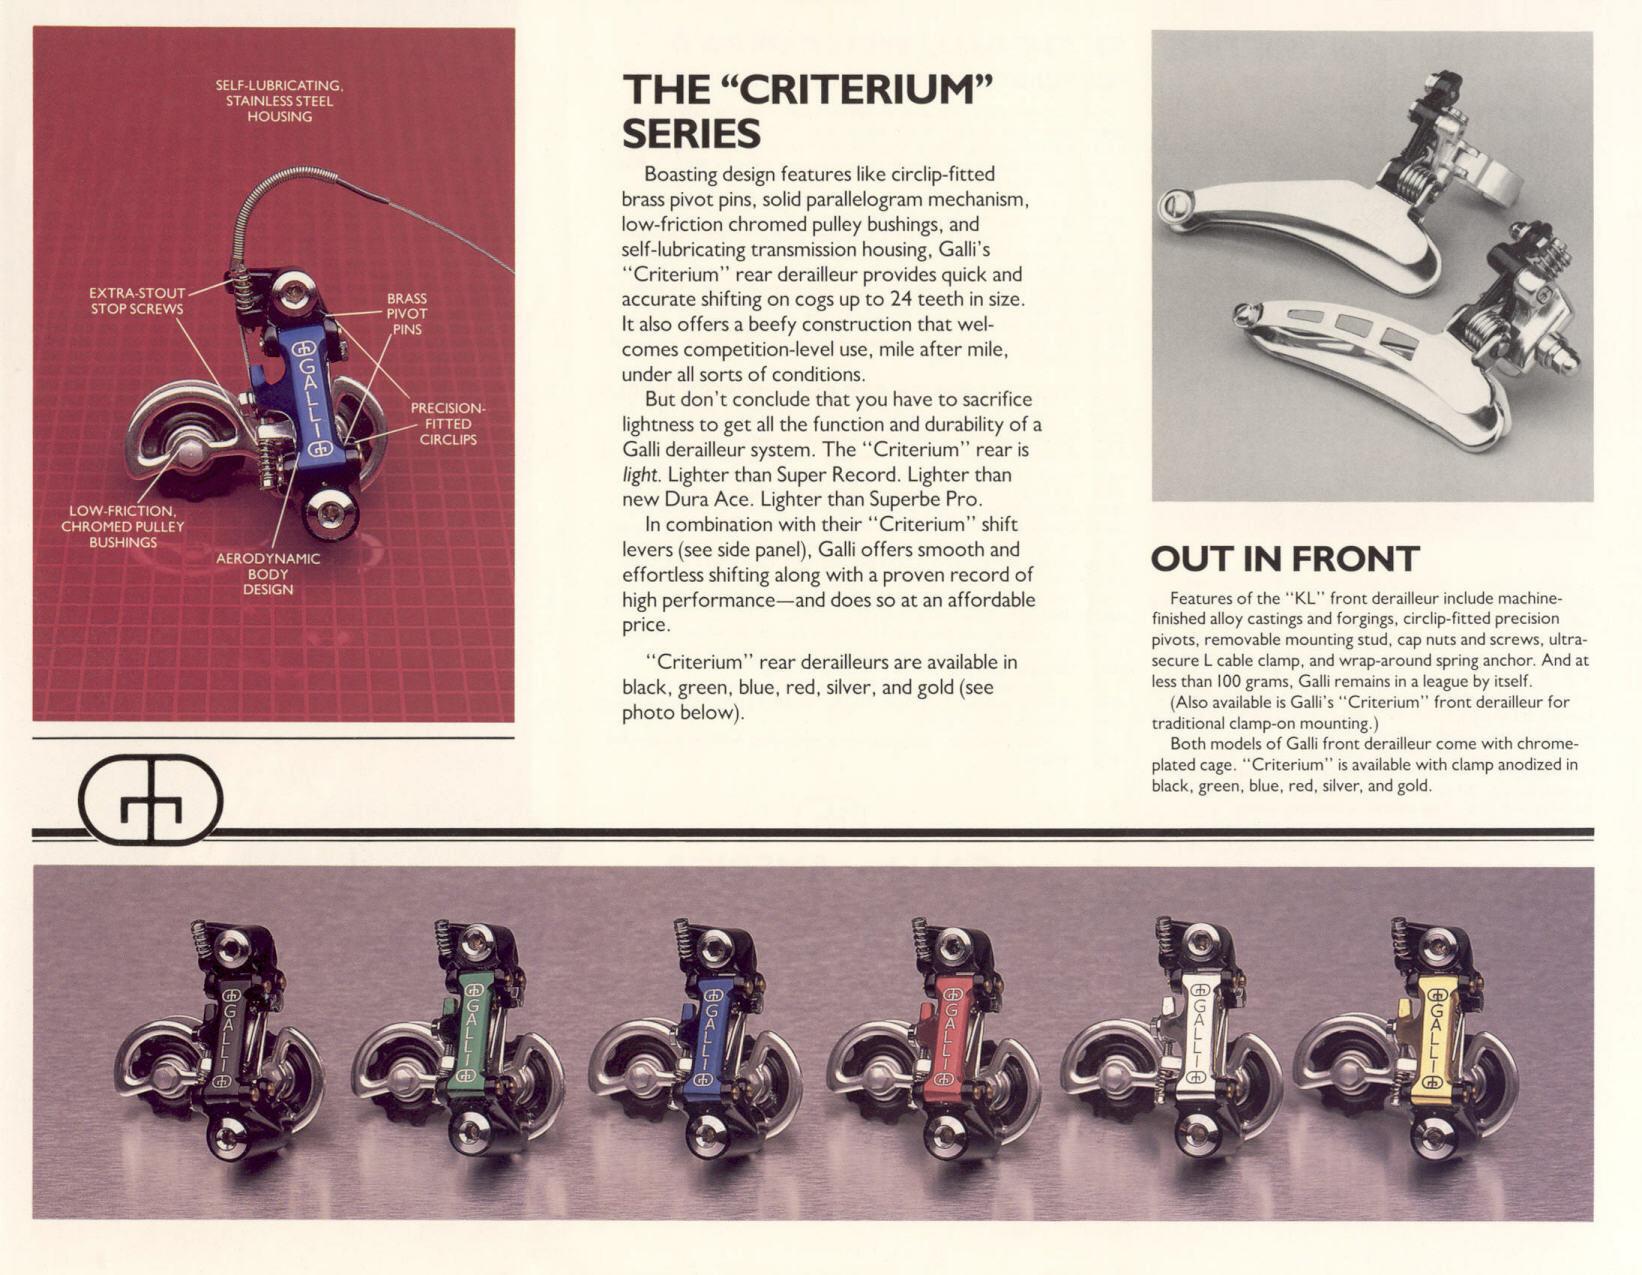 Galli KL serie cambio catalogo 1986 (2).jpg